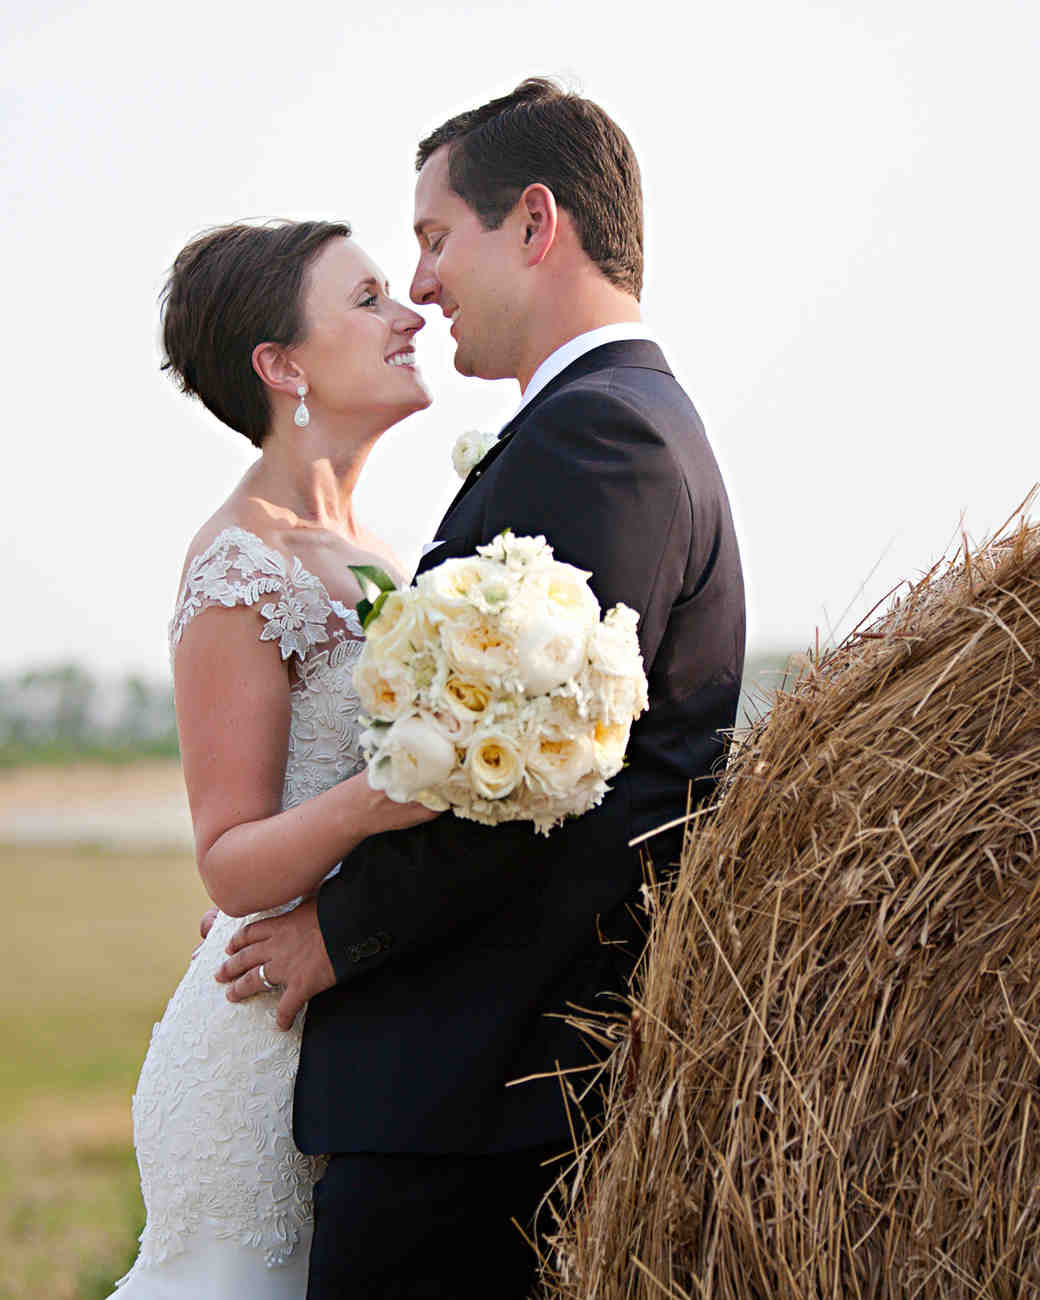 A Vintage Rustic Farm Destination Wedding in Kansas